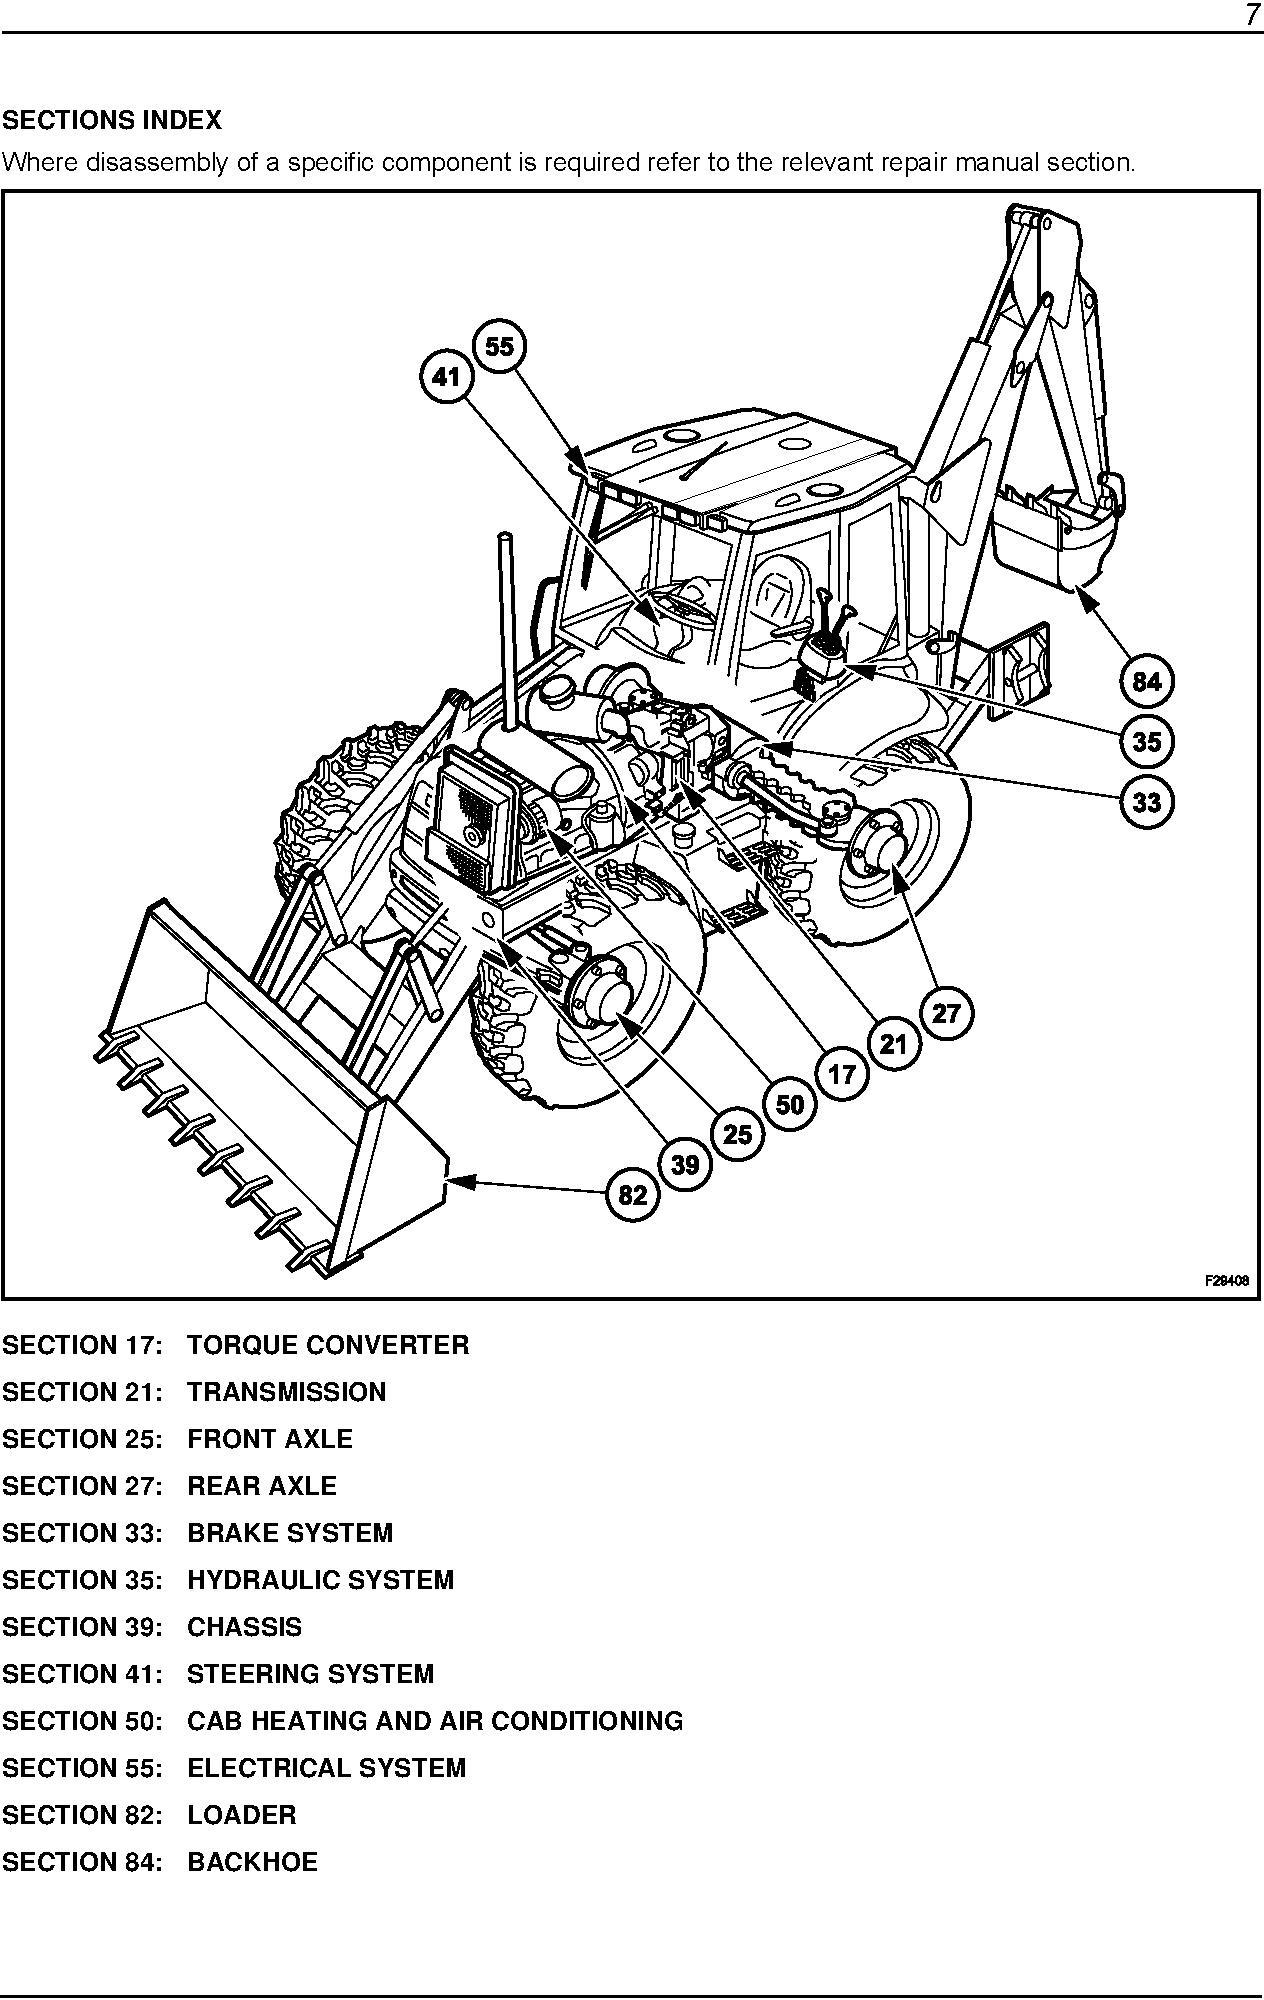 New Holland B110, B115 Tier 3 Loader Backhoe Service Manual - 1